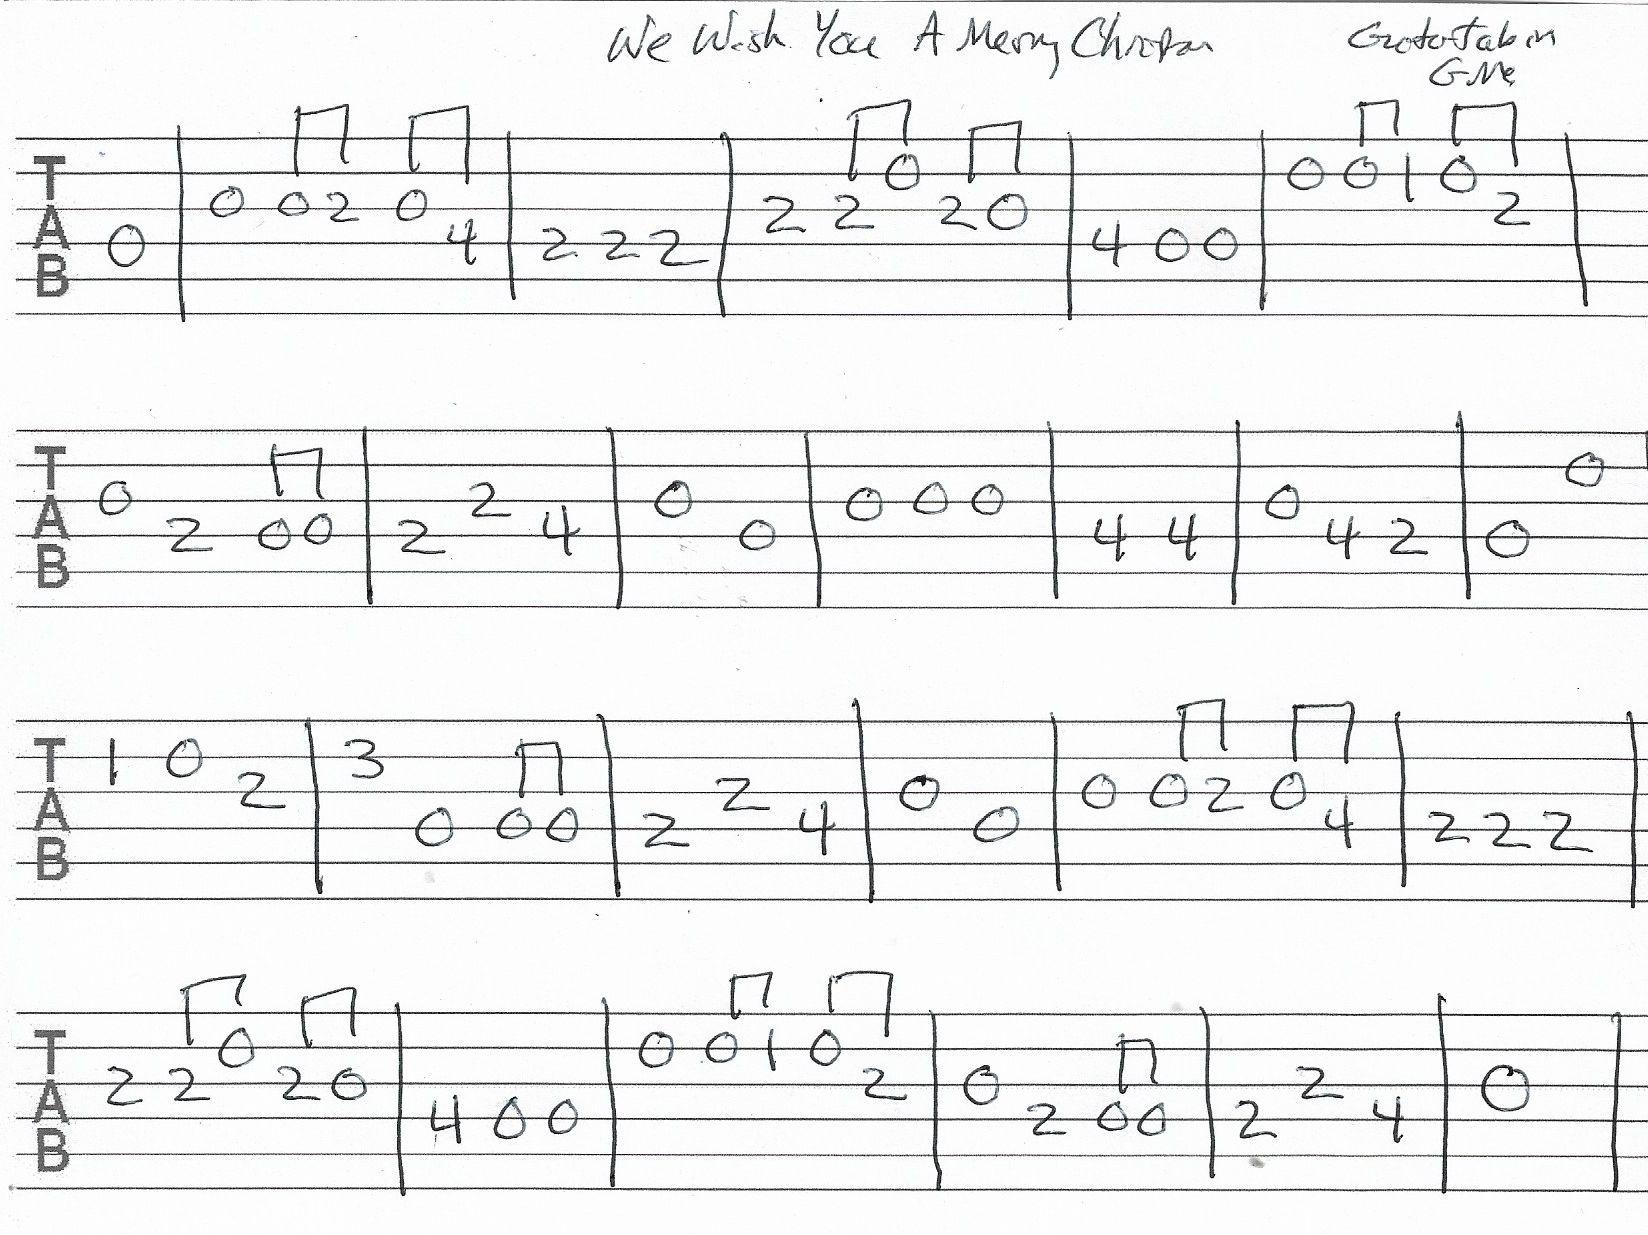 We Wish You A Merry Christmas - Guitar Tab in G Major (con imágenes) | Tablaturas guitarra ...